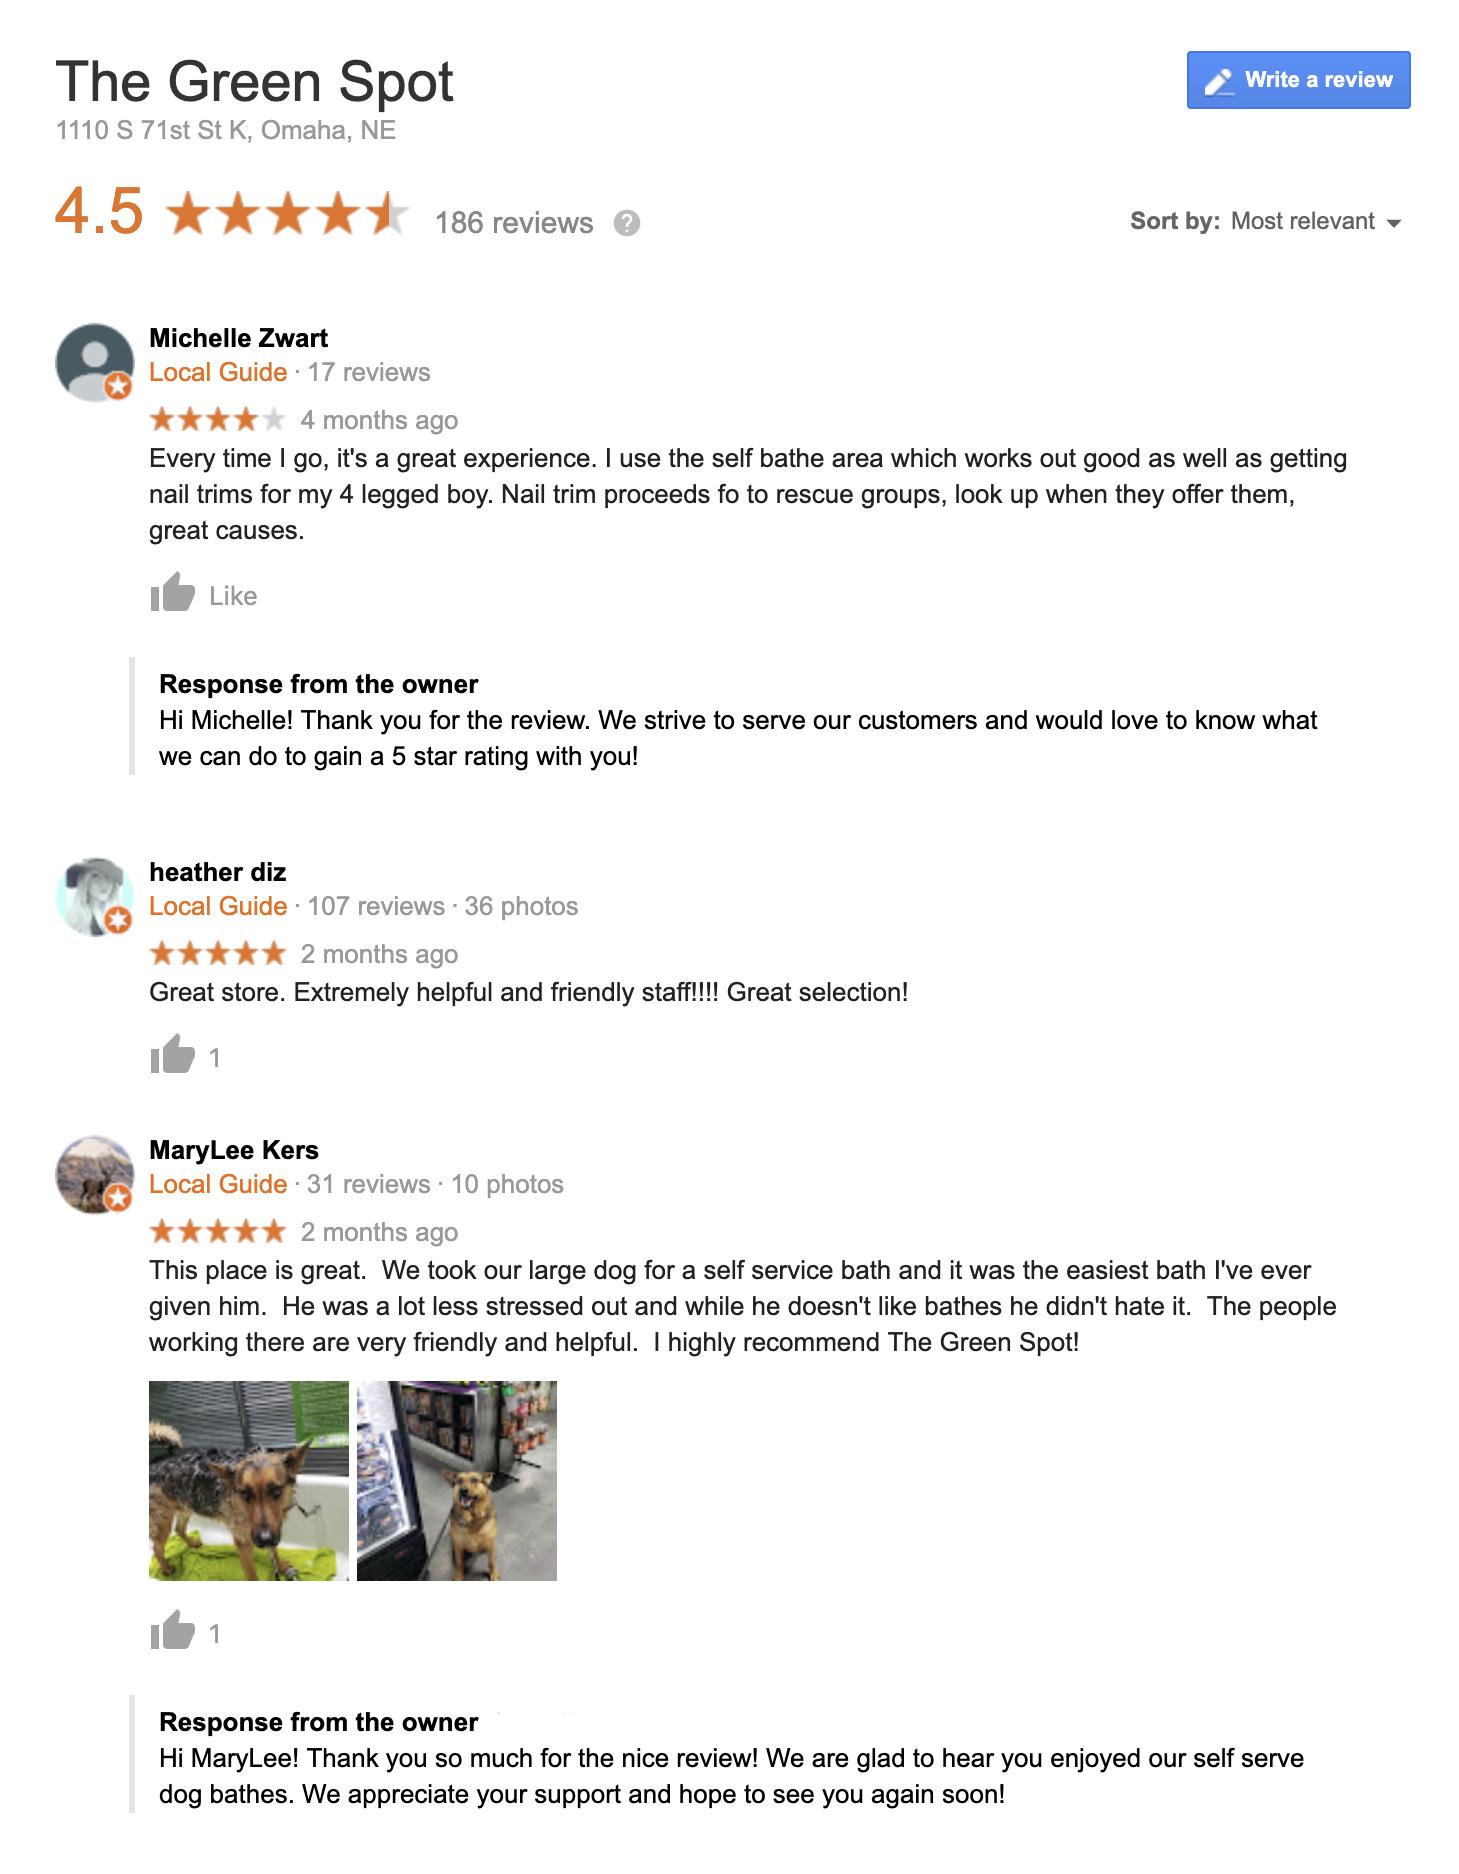 customer-review-responses